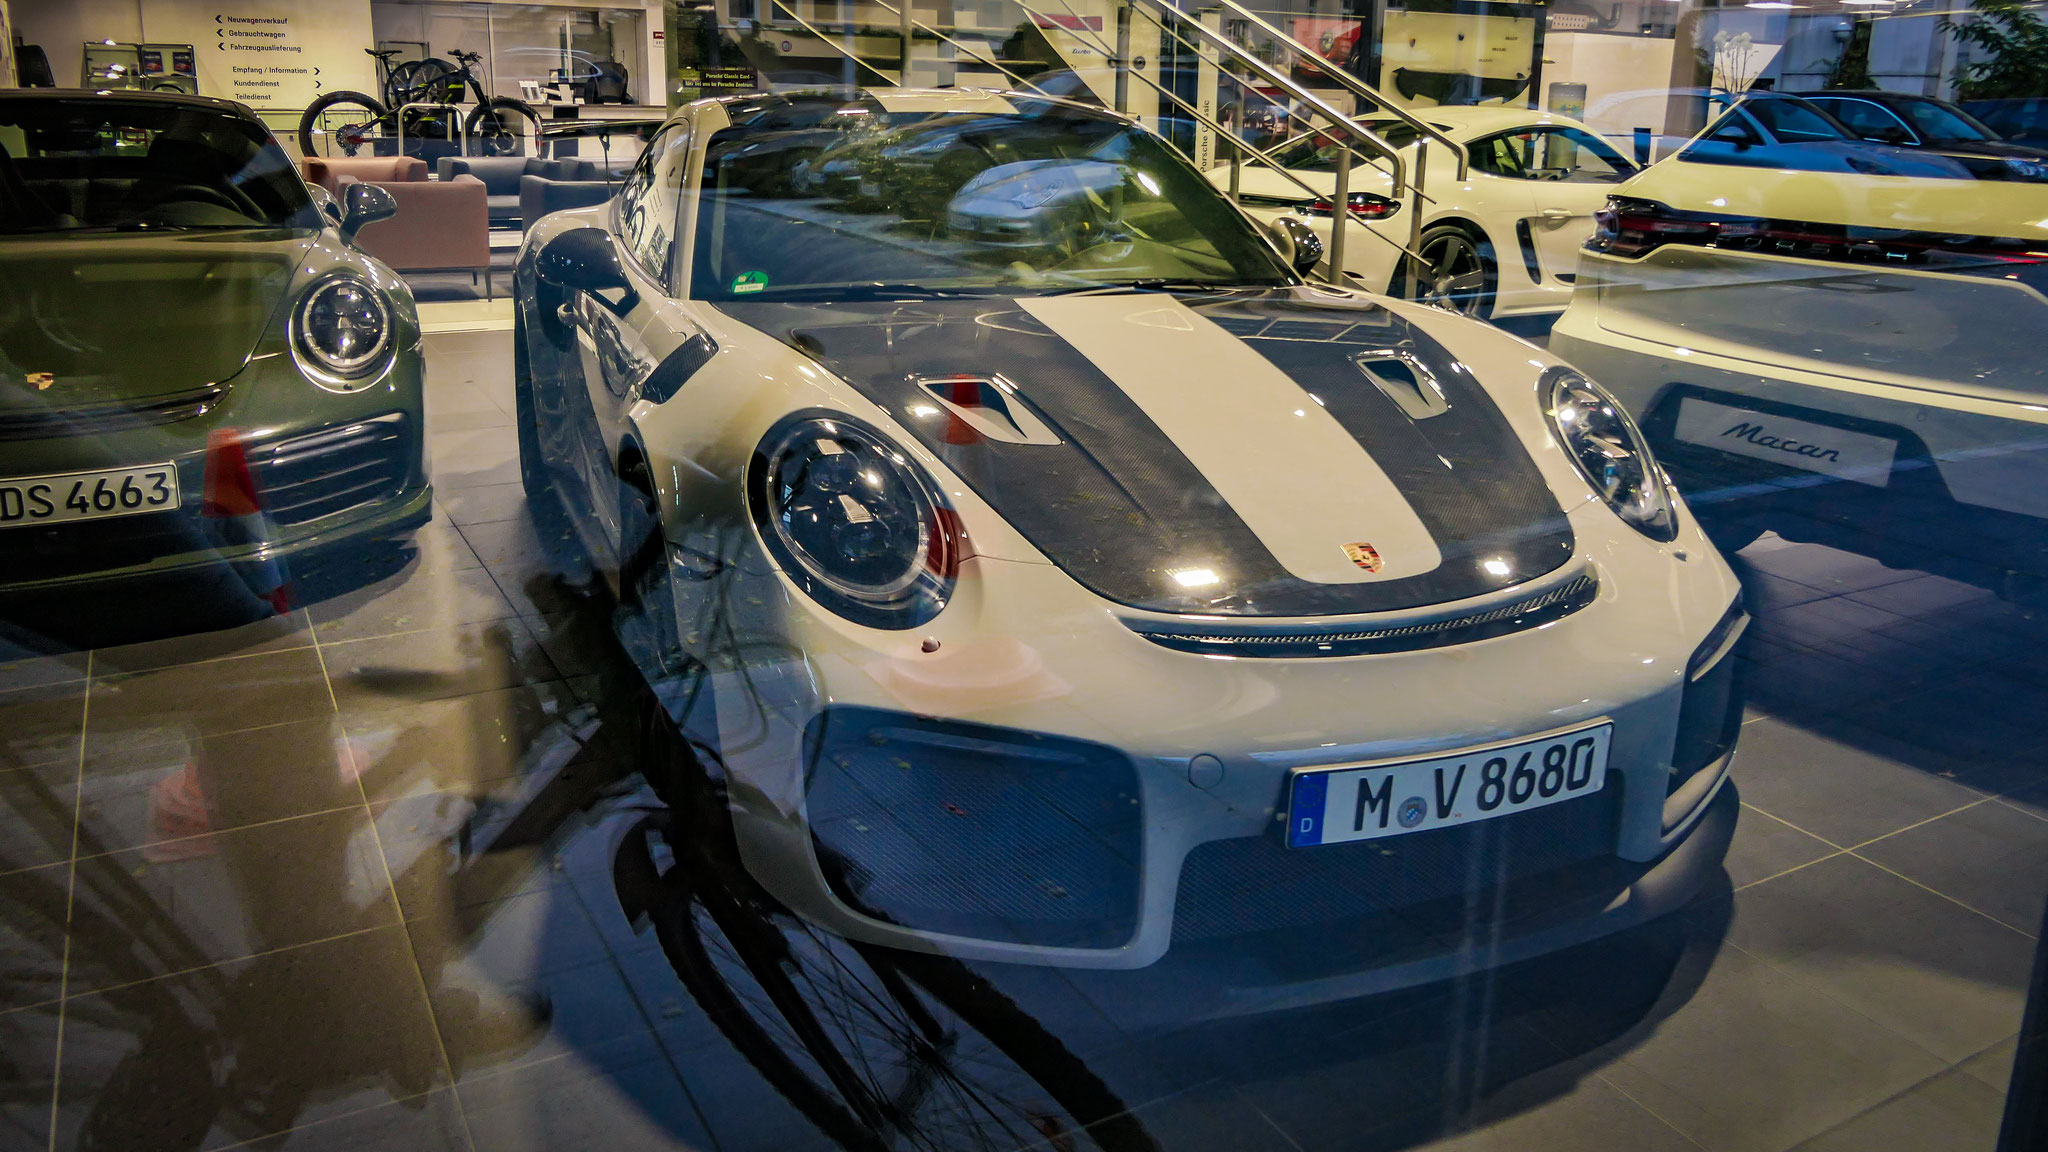 Porsche GT2 RS - M-V-8680